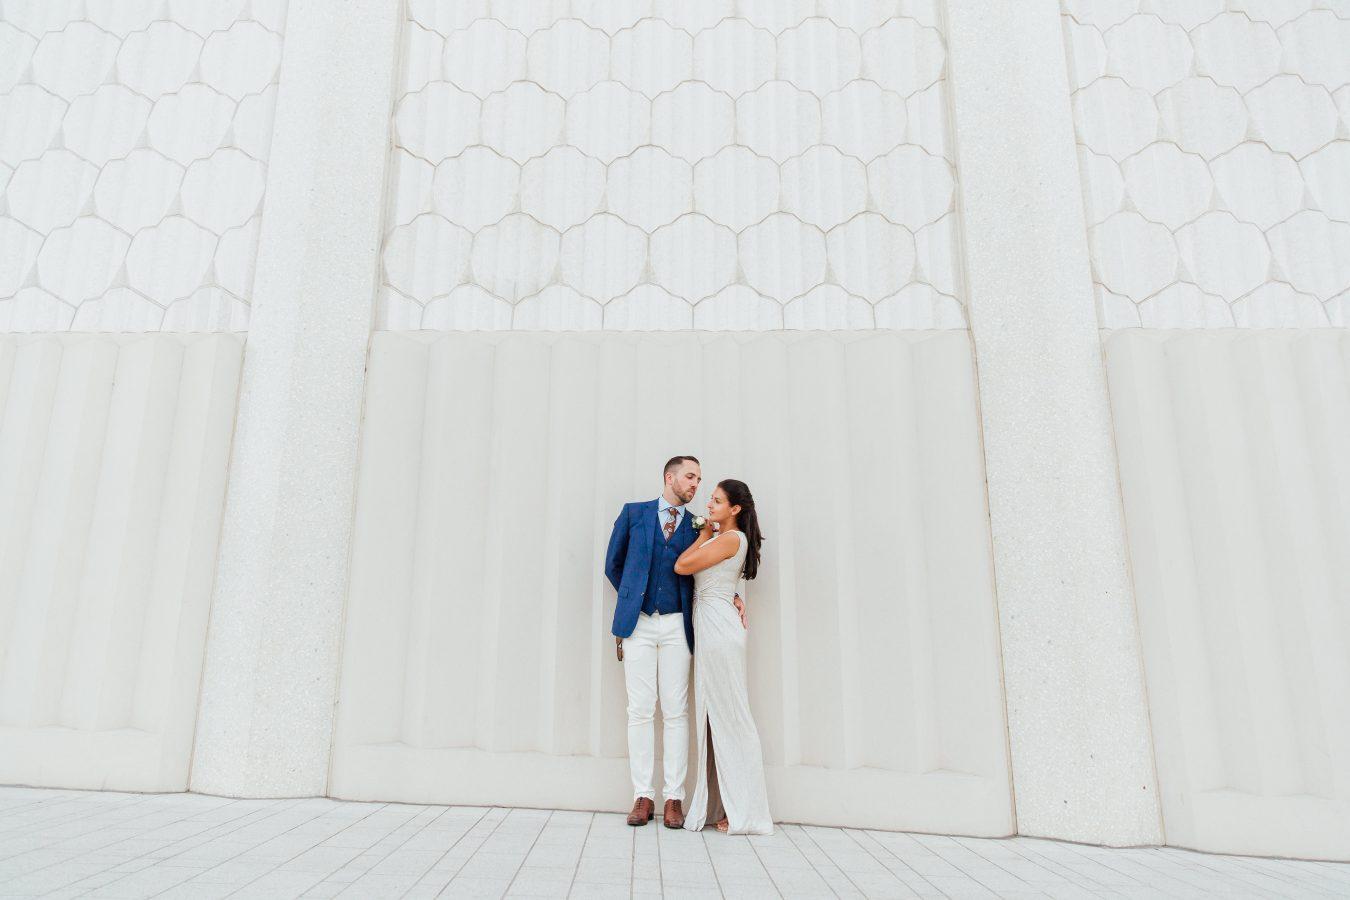 Laura-George-Jules-Barron-Leeds-Inner-City-Wedding-2018-903